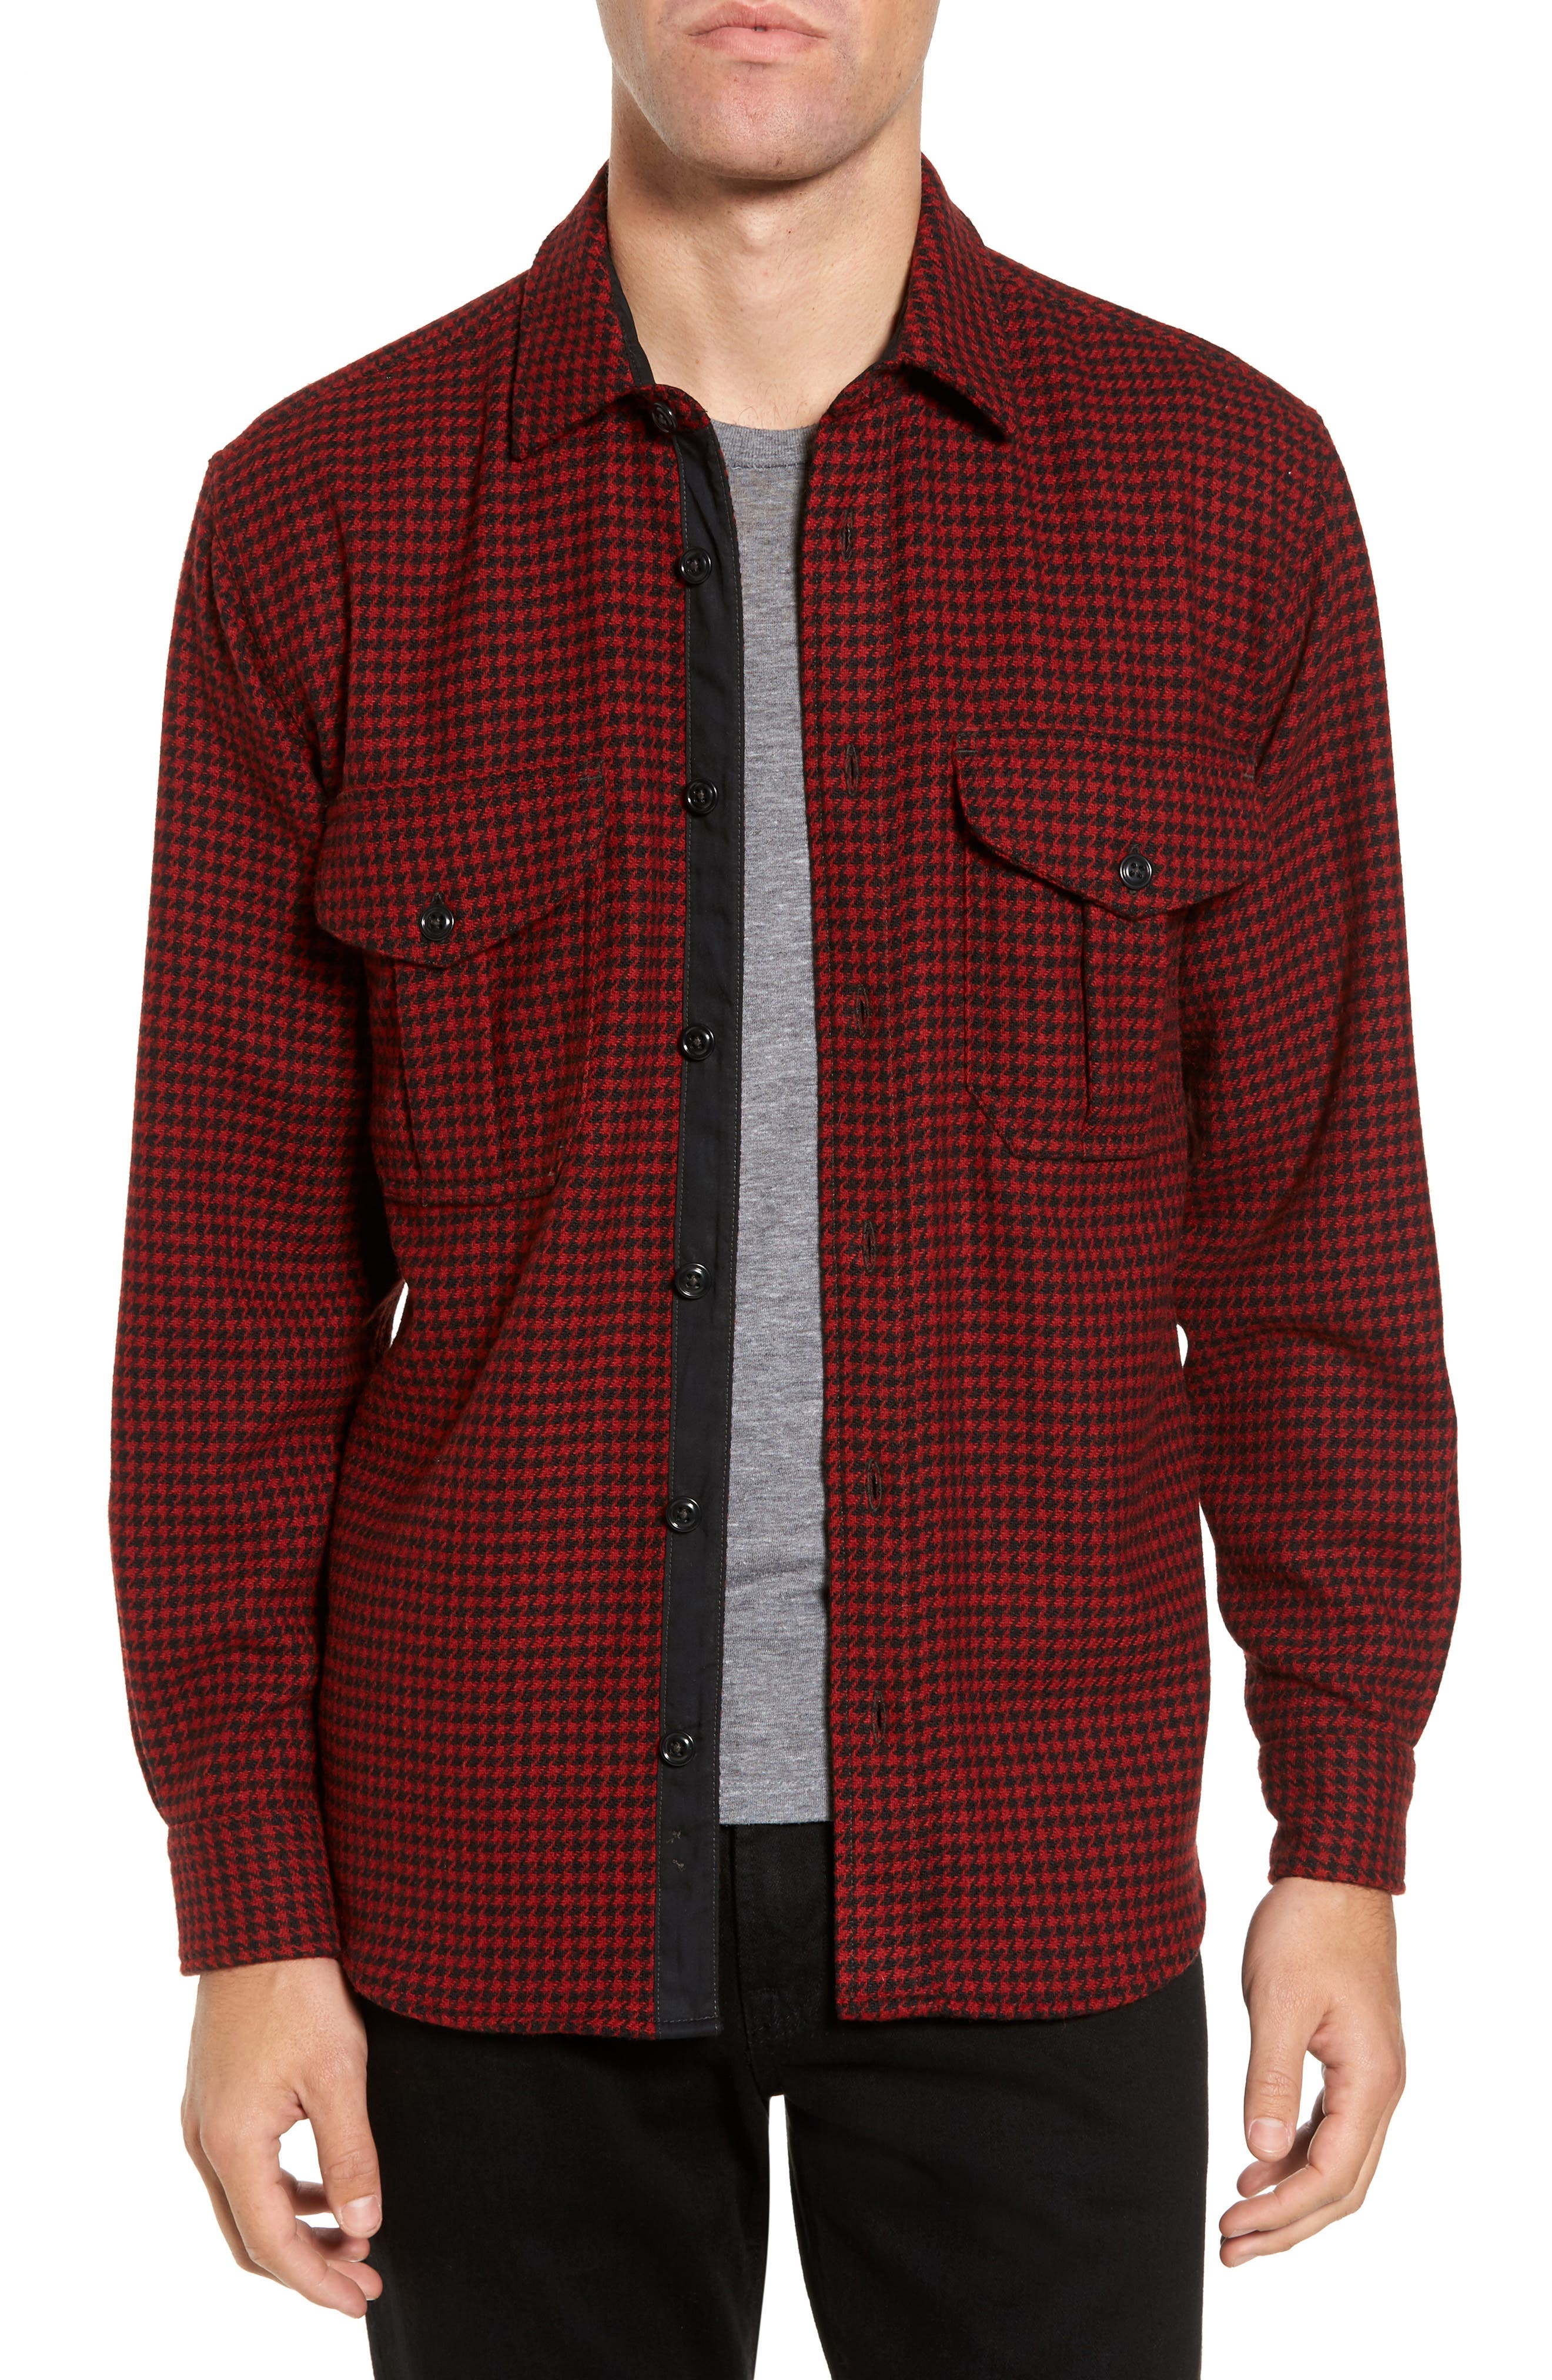 Northwest Houndstooth Shirt Jacket,                             Main thumbnail 1, color,                             645